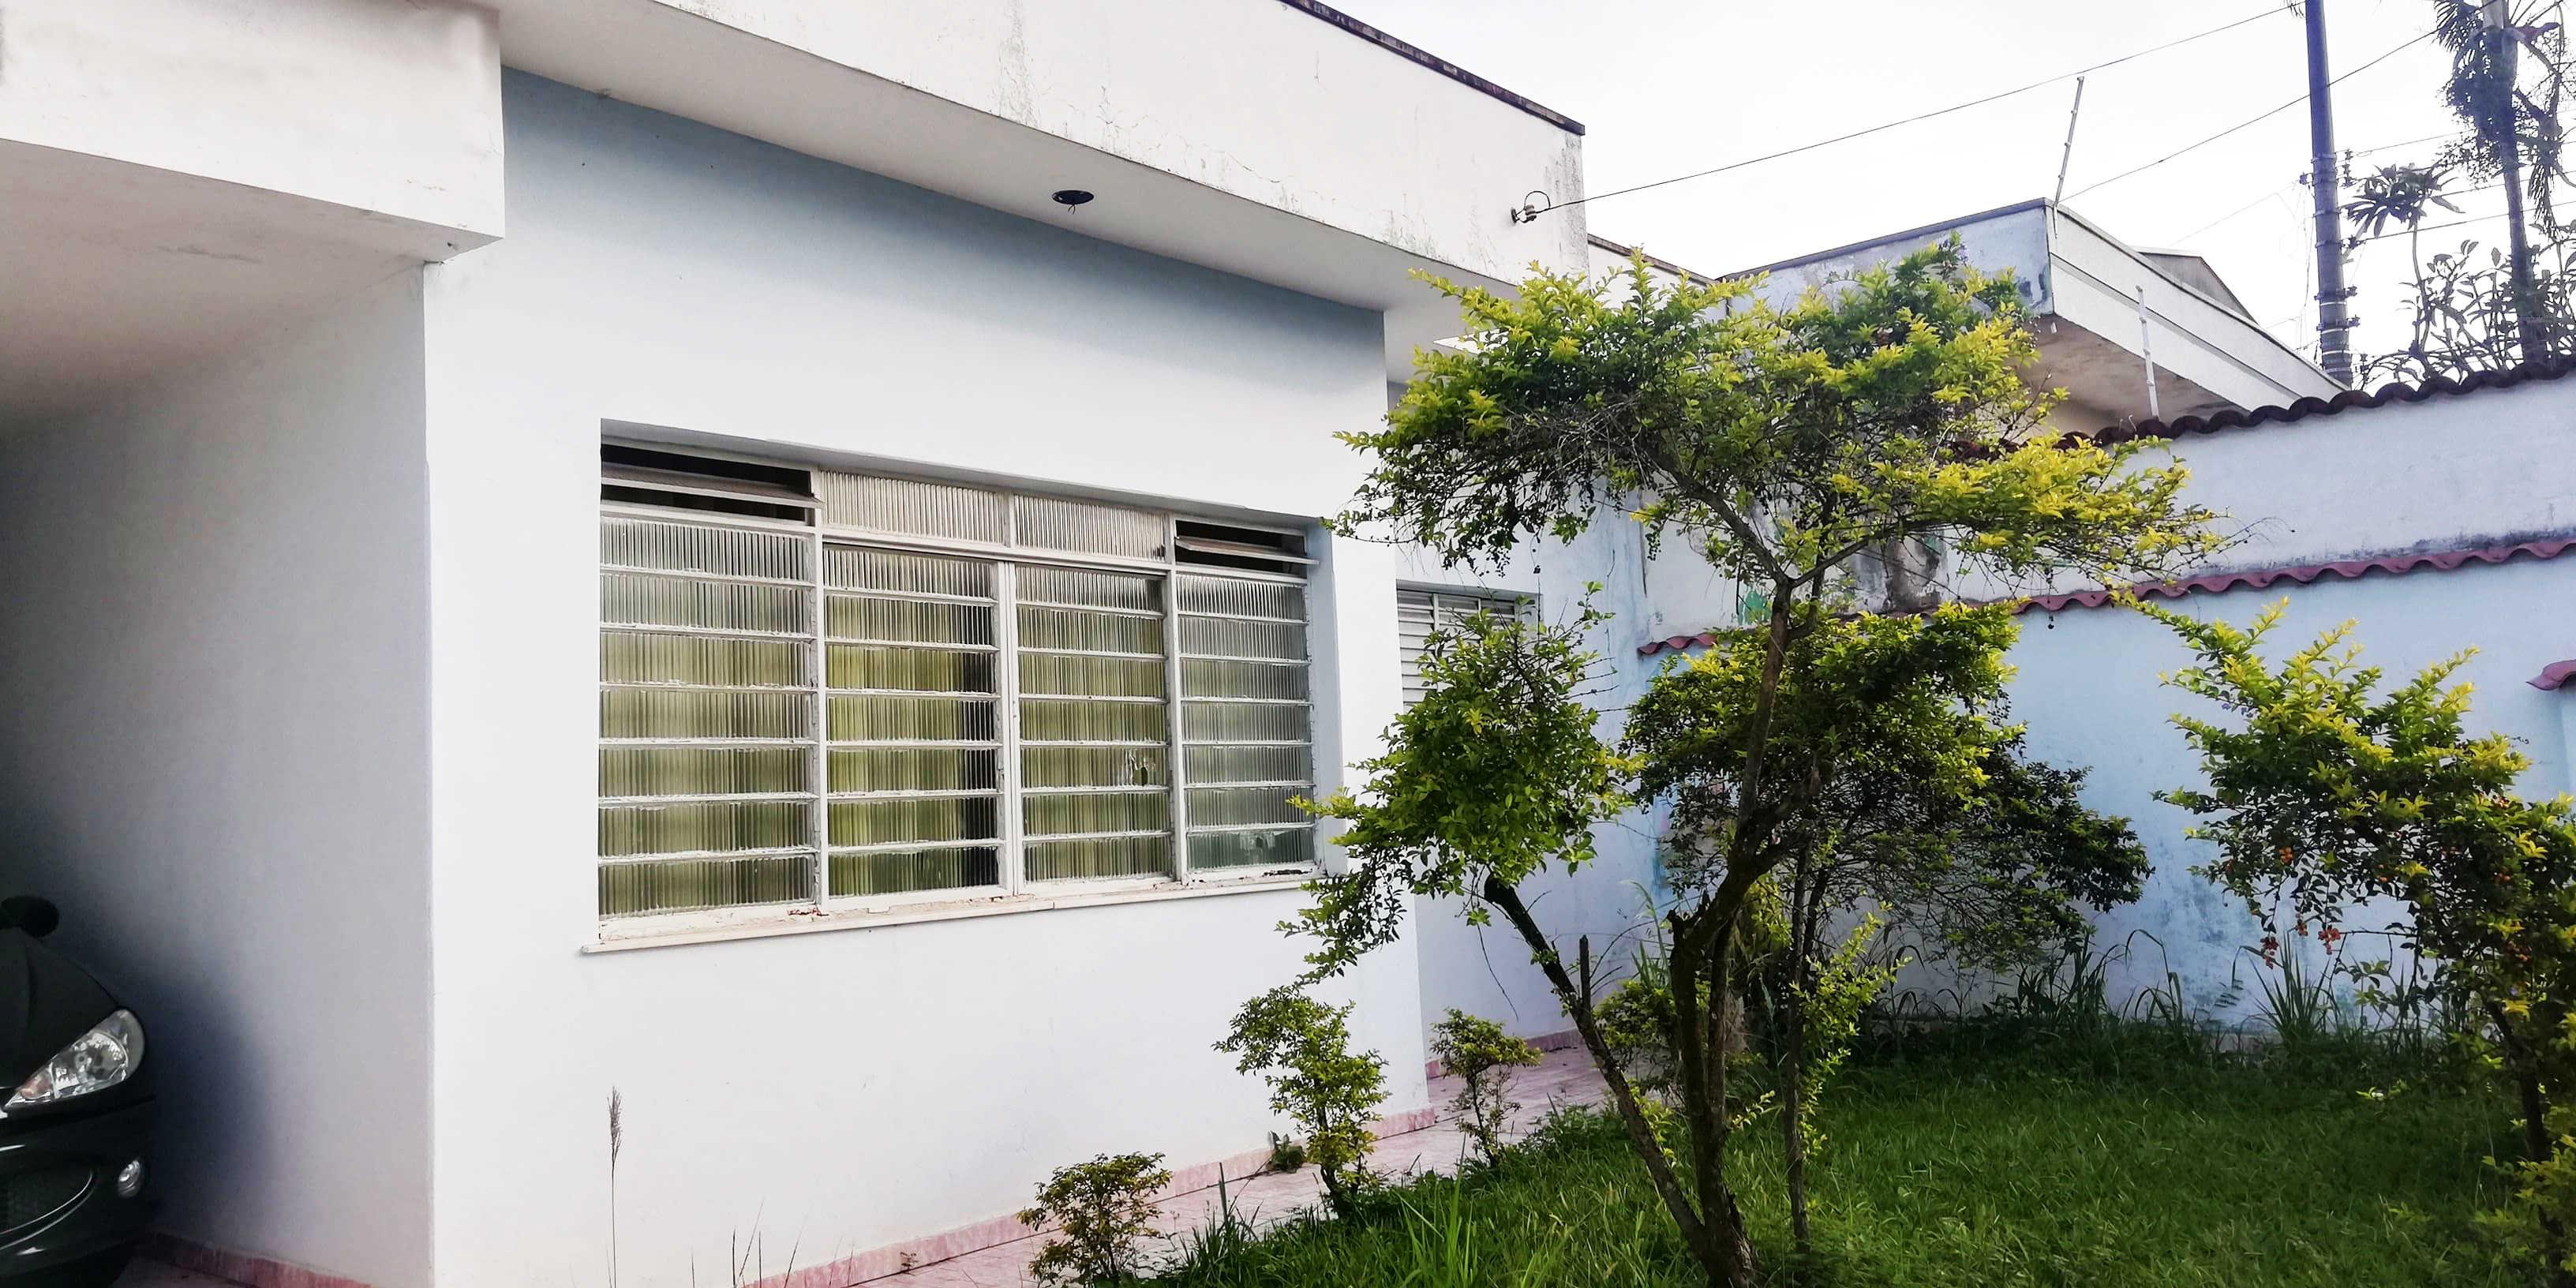 Casa Mogi das cruzes / Vila industrial